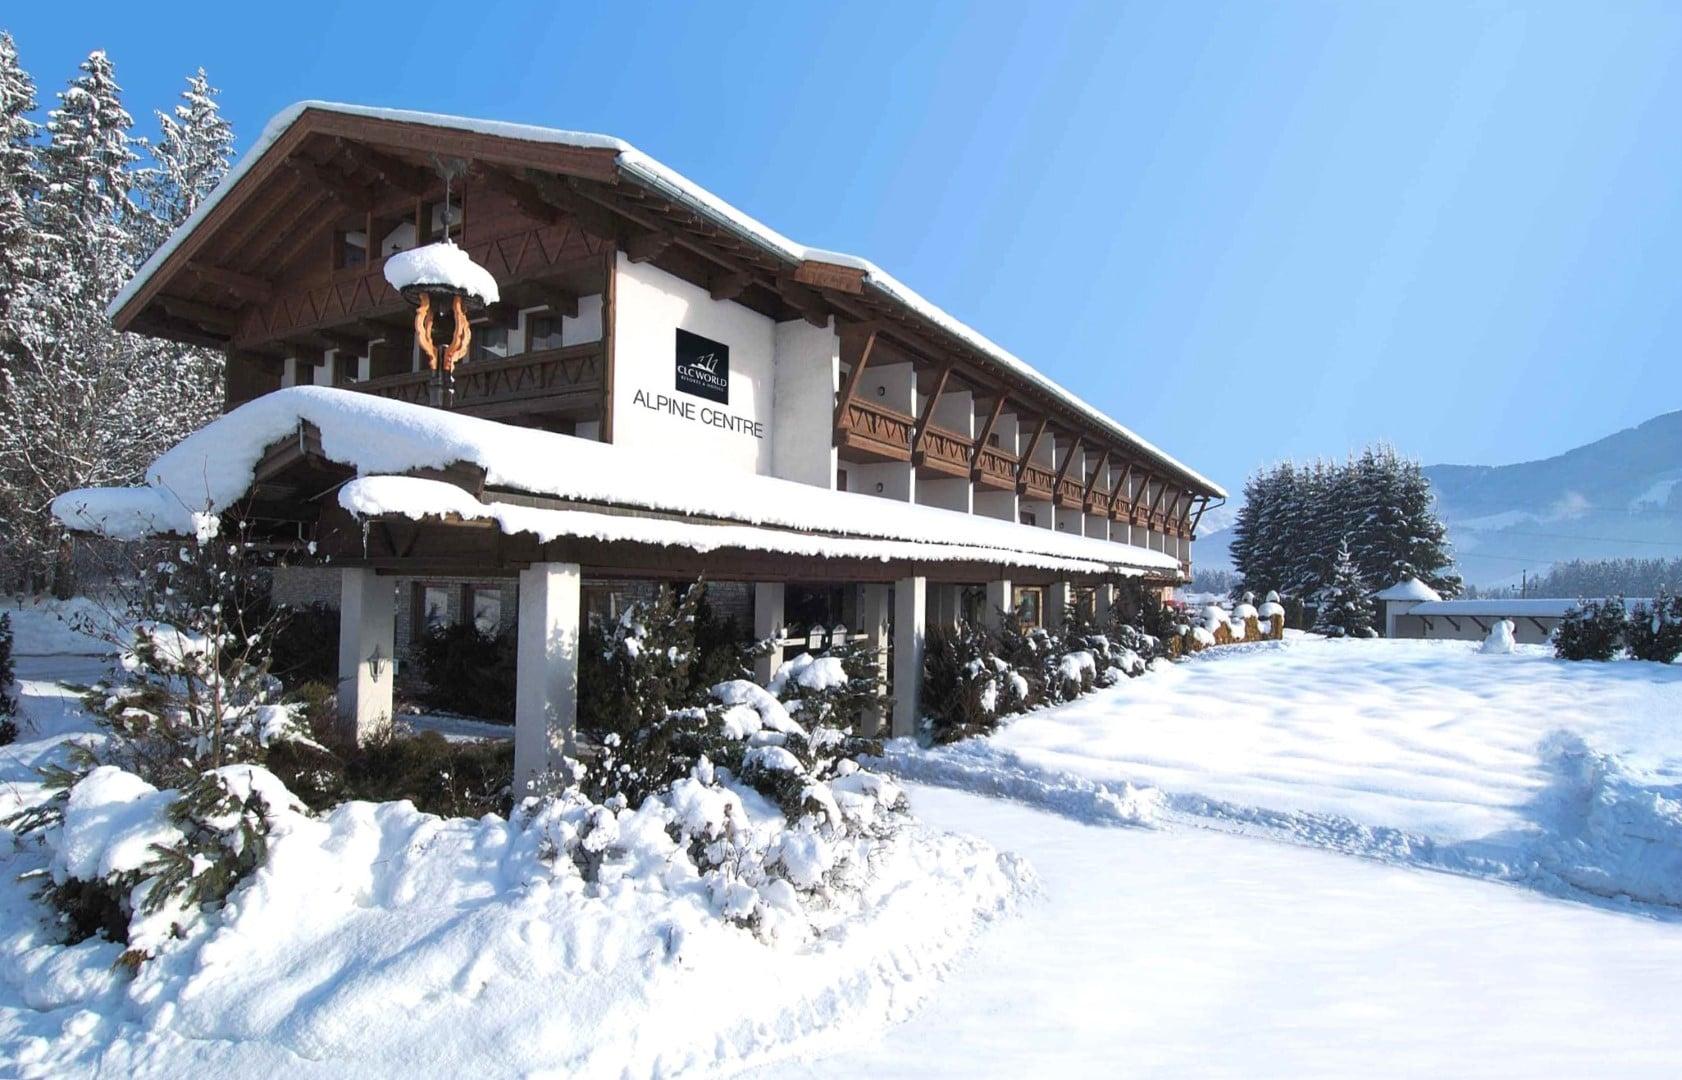 Wintersport in skigebied Saalfelden: tips en aanbiedingen!